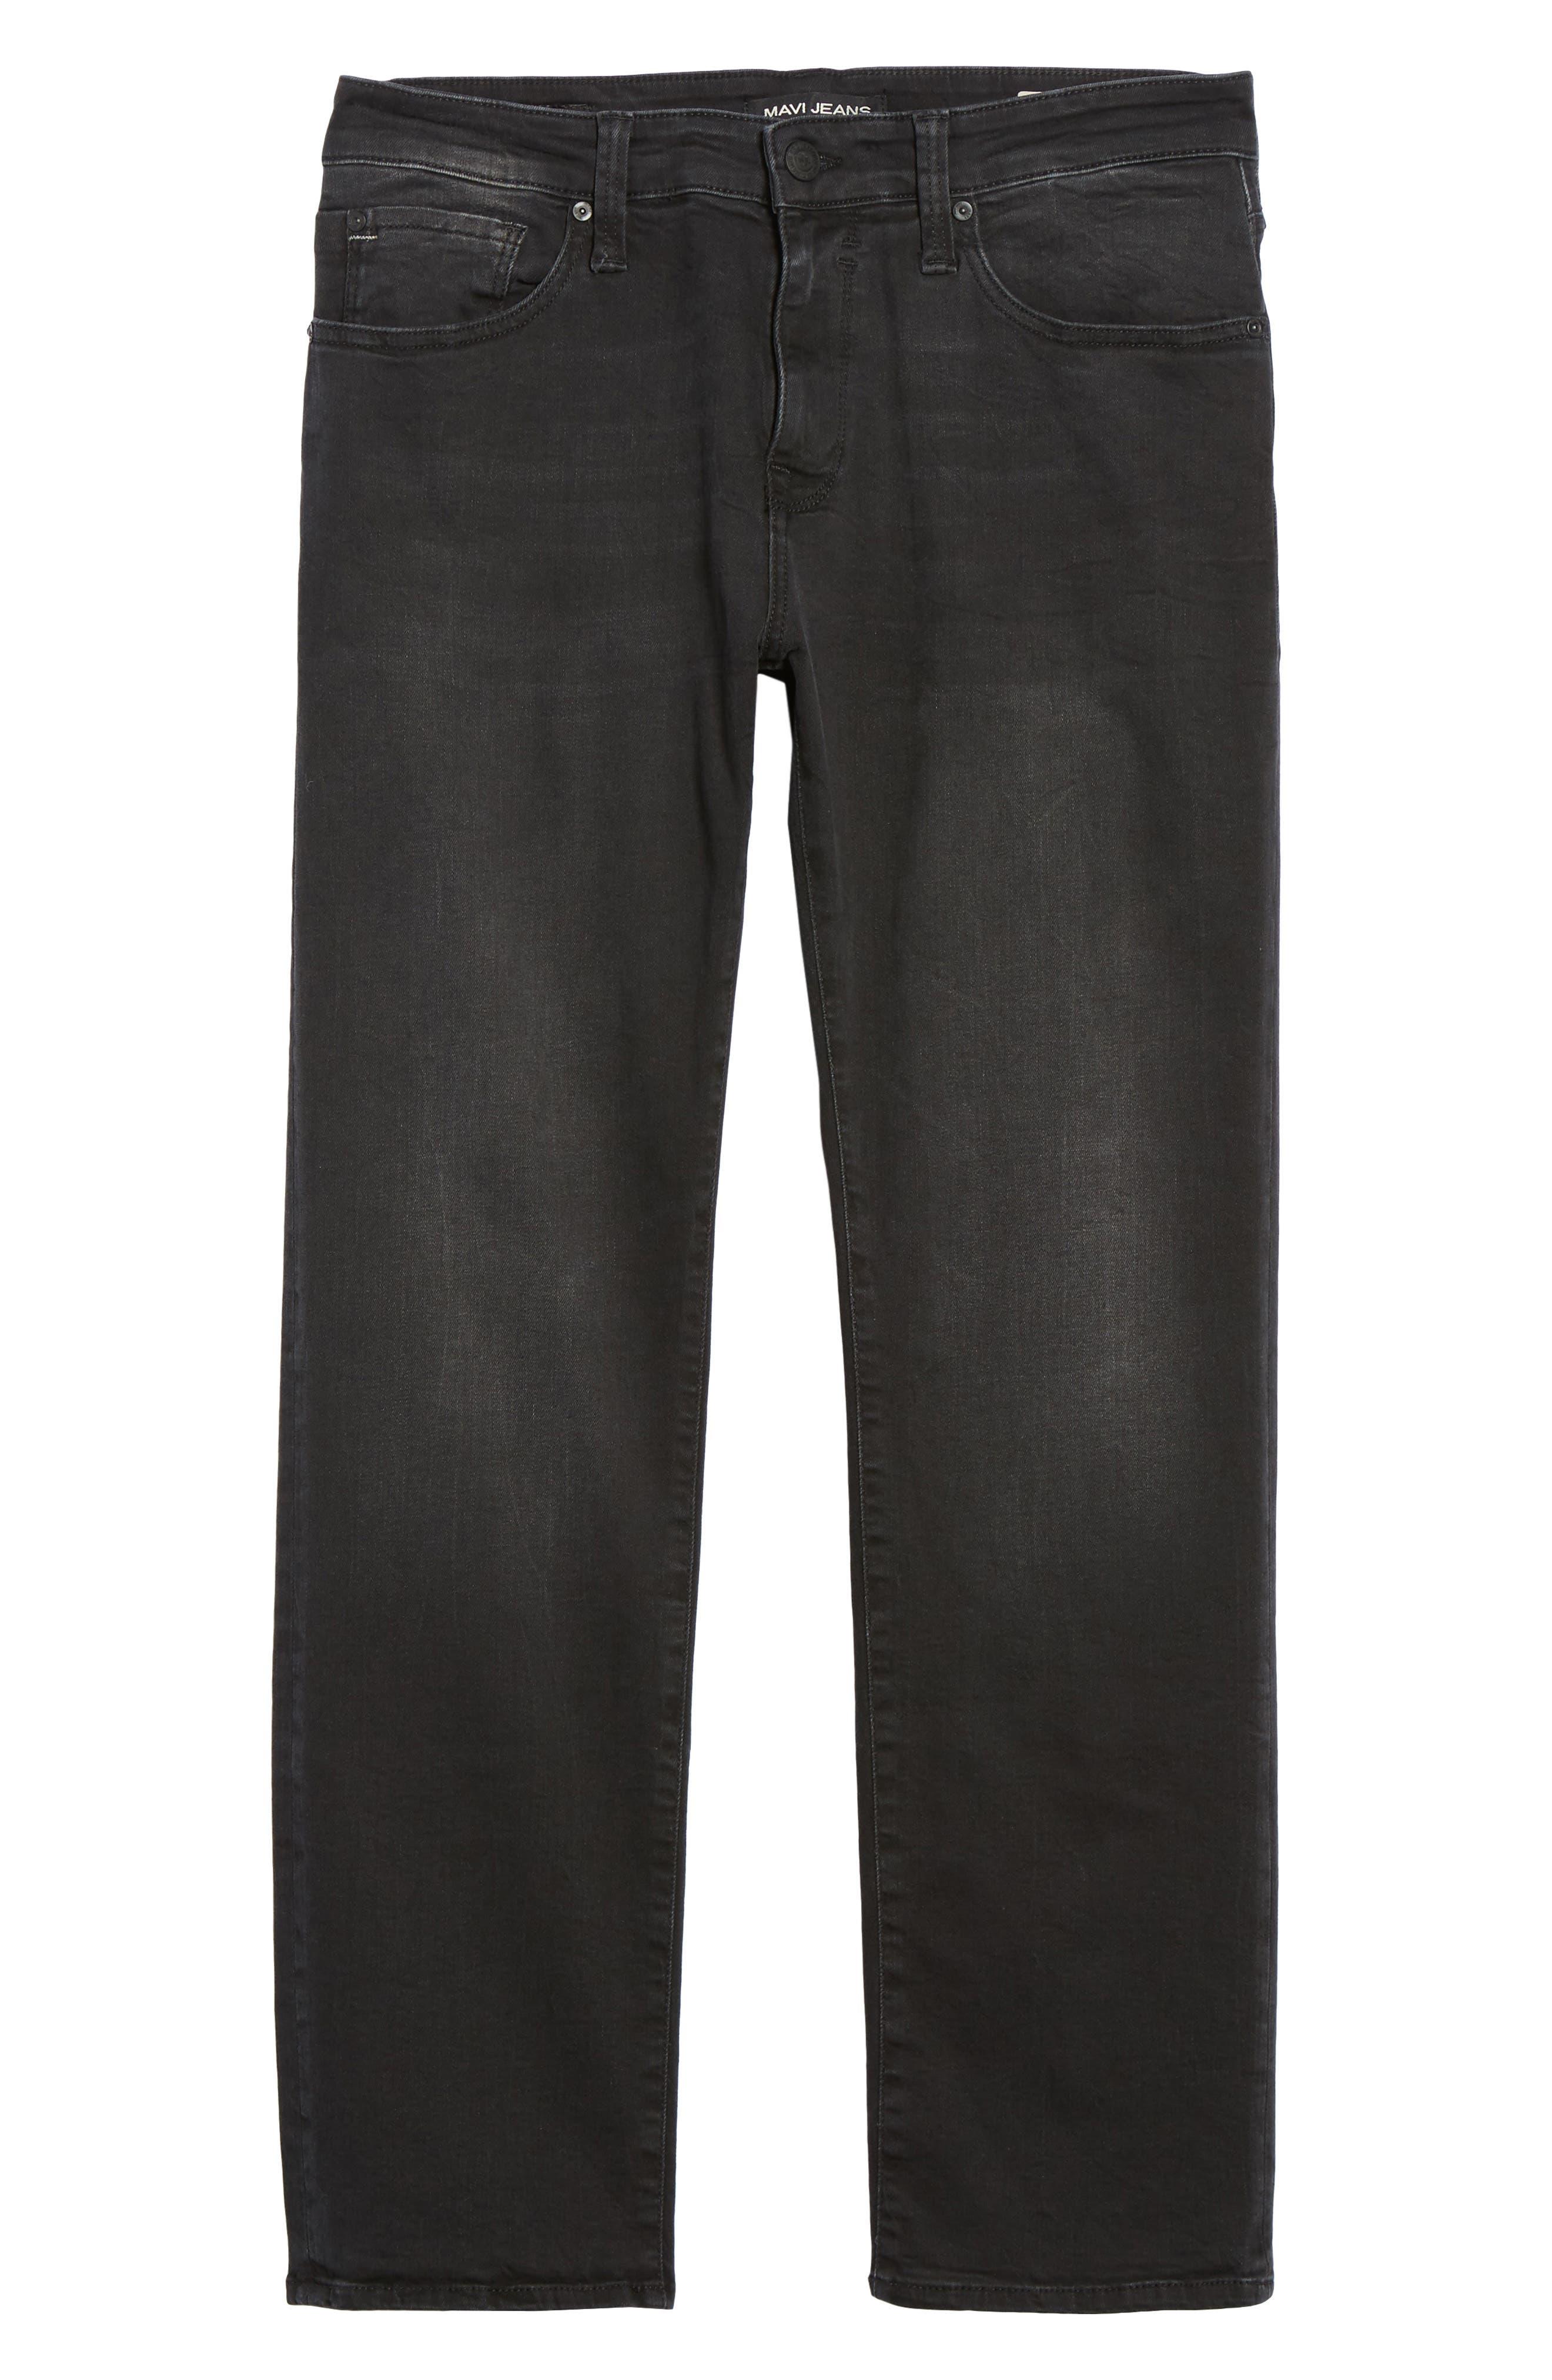 Zach Straight Fit Jeans,                             Alternate thumbnail 6, color,                             050